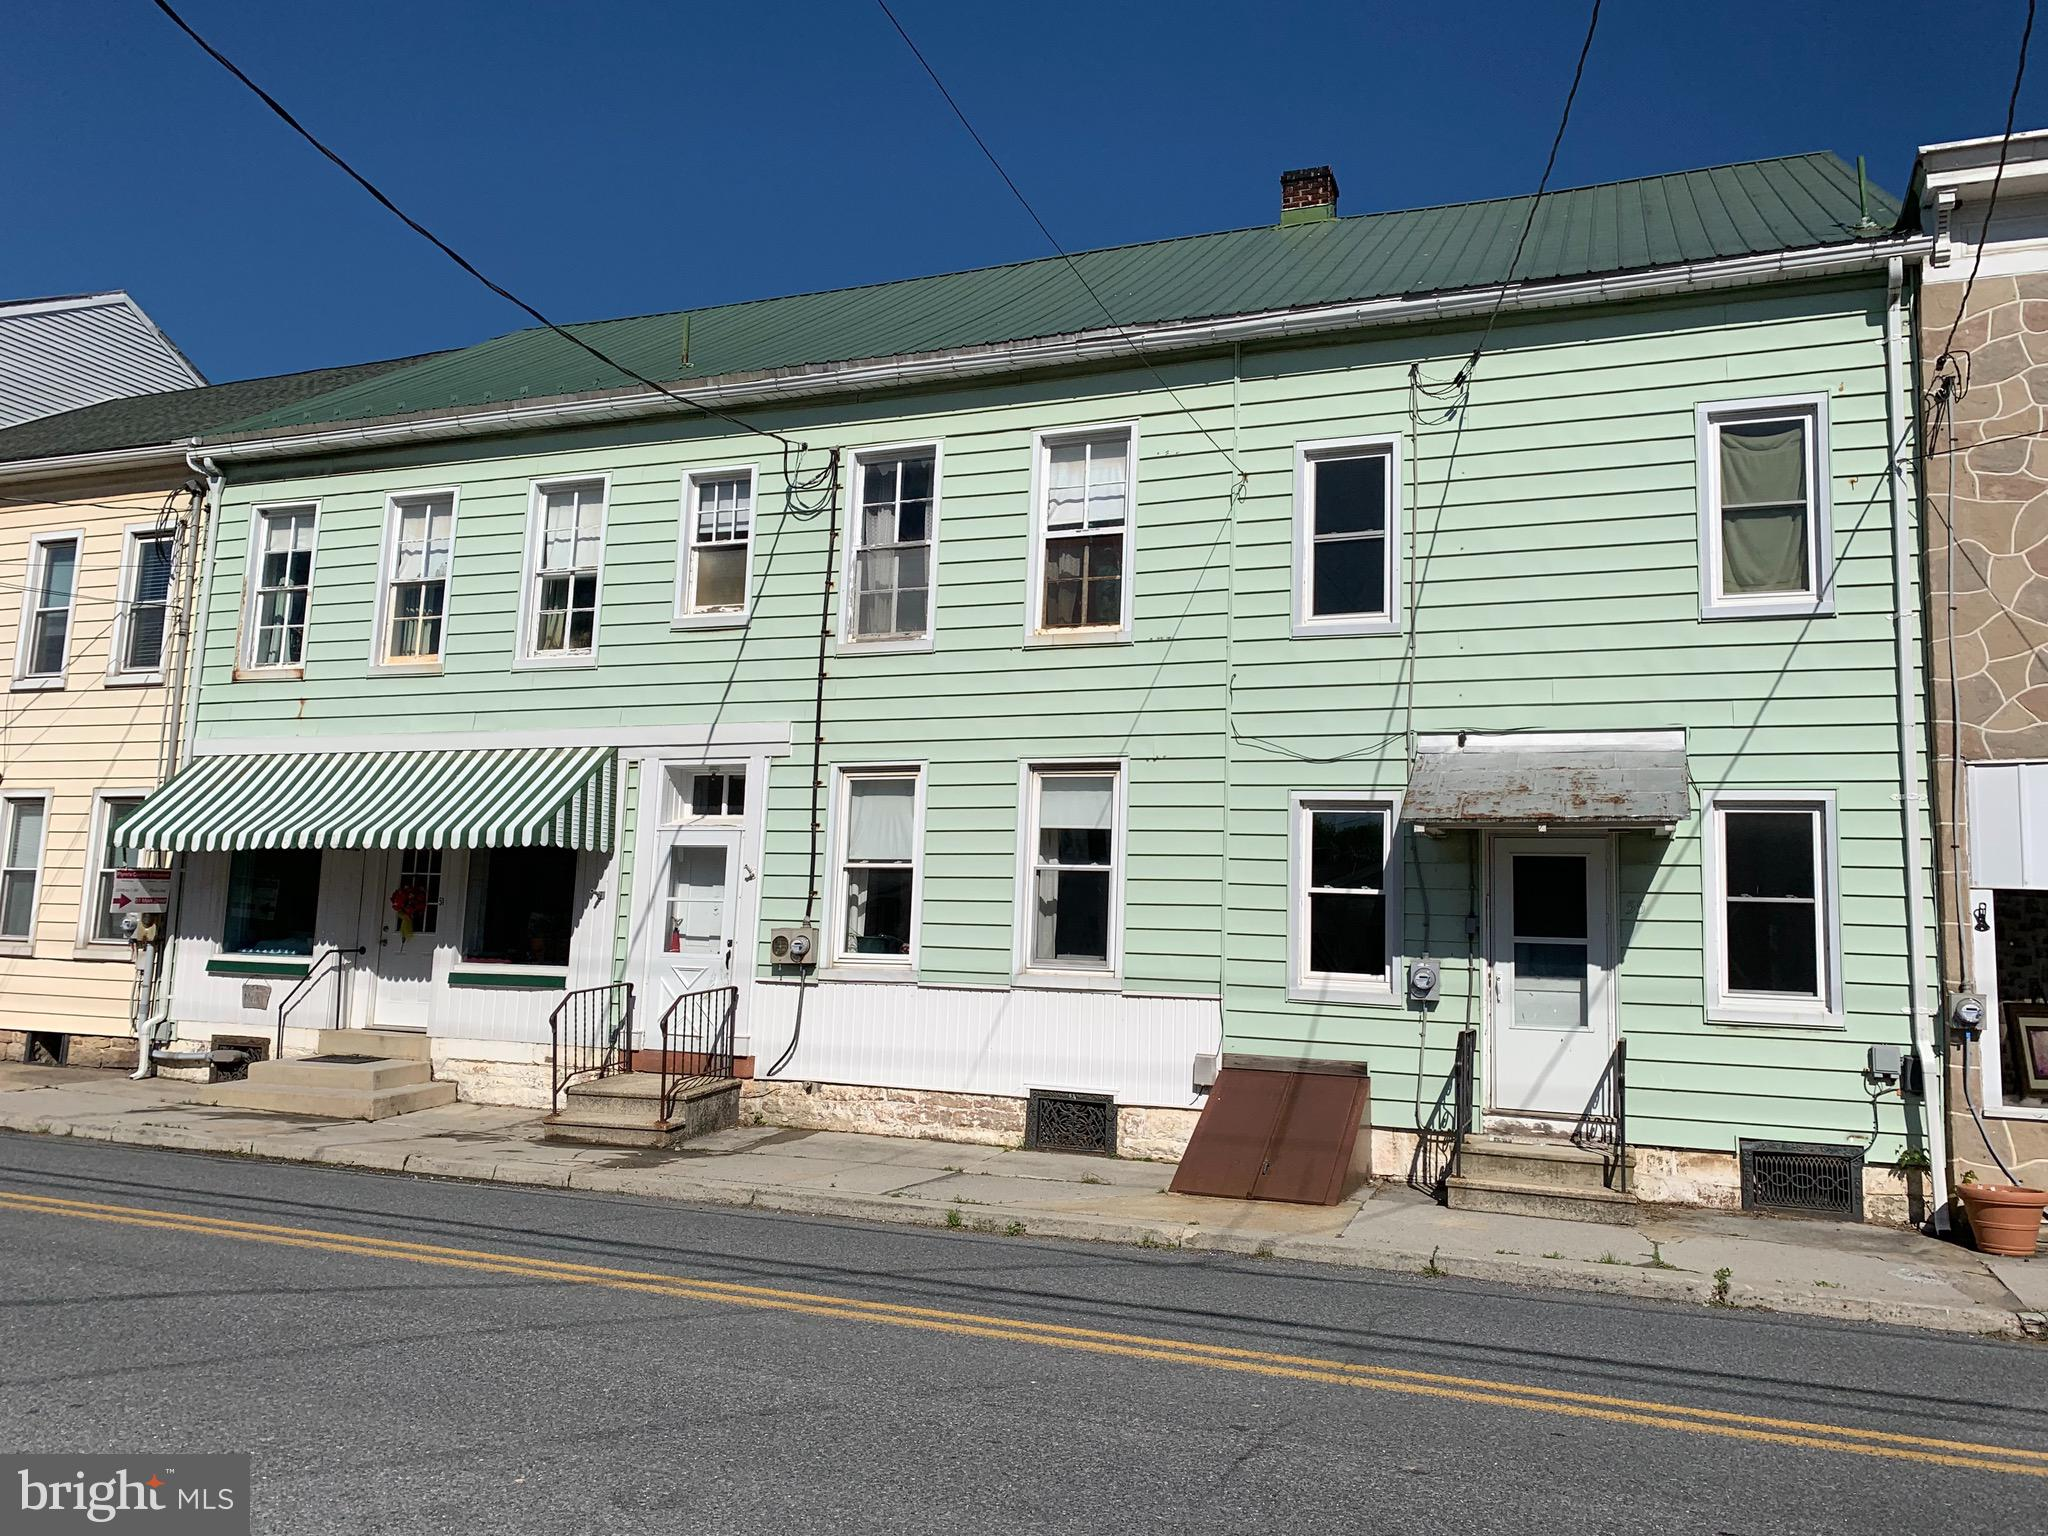 53 MAIN STREET, BETHEL, PA 19507